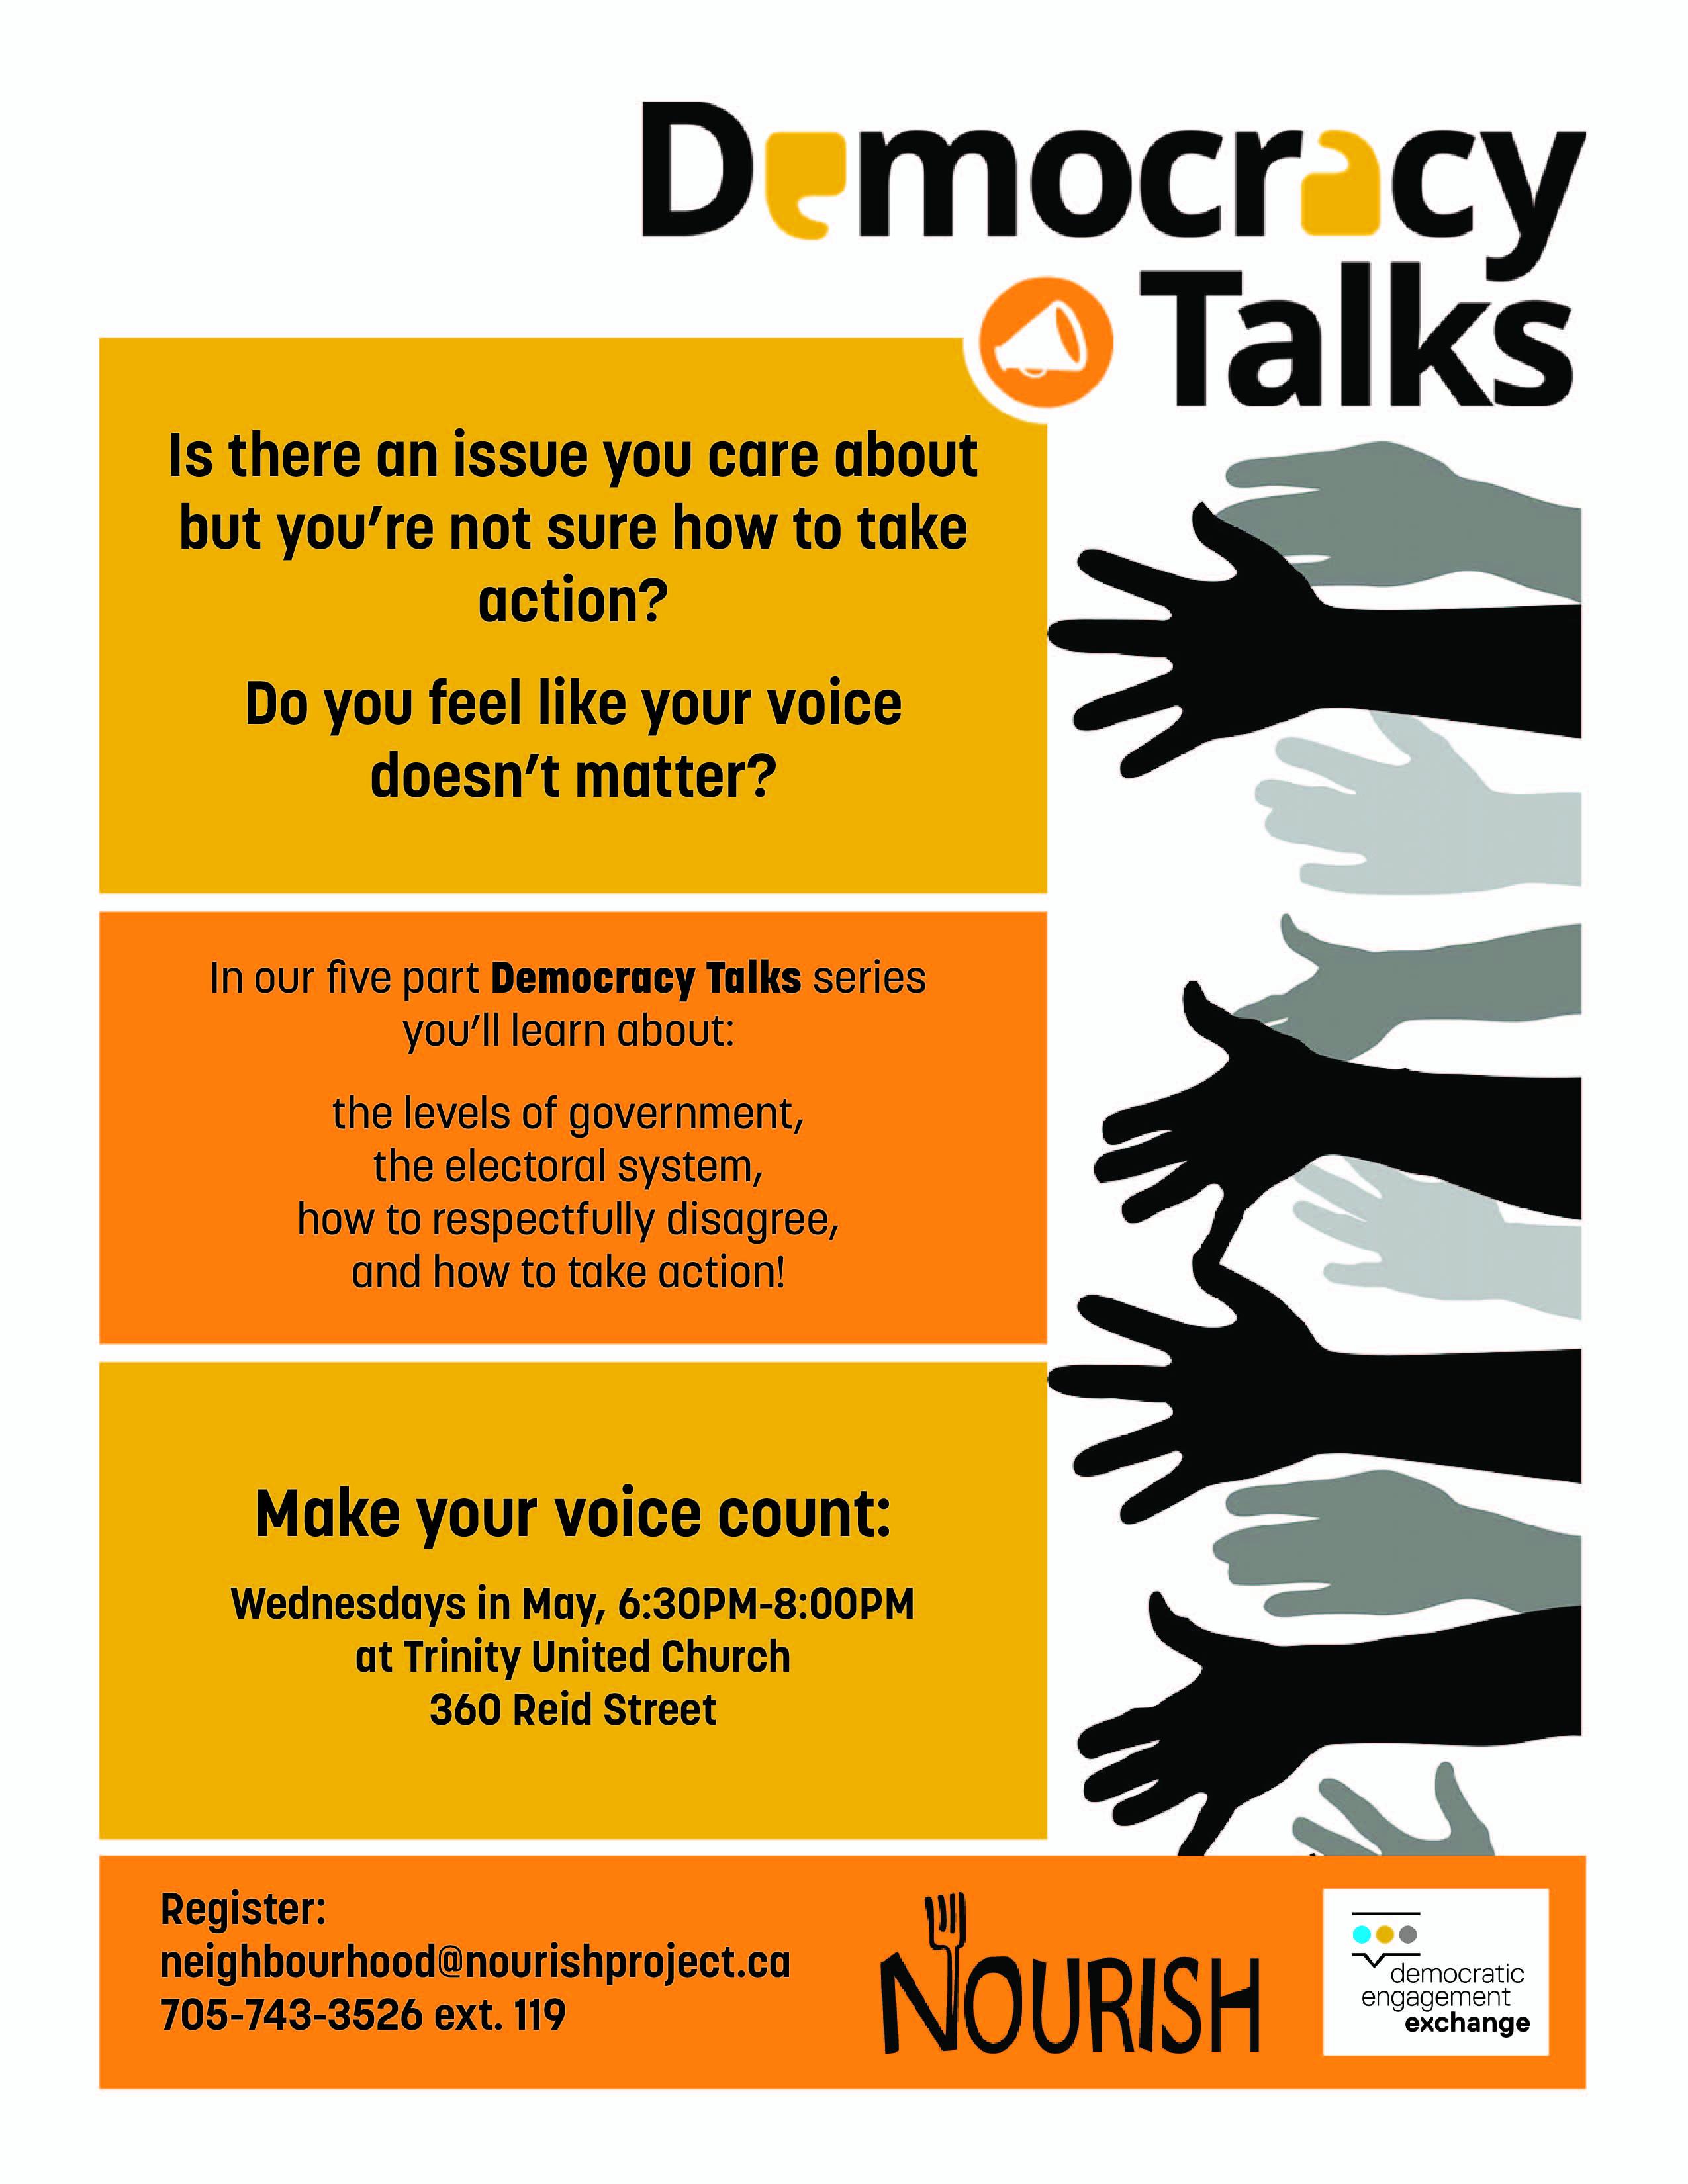 Democracy Talks - Evenings at Trinity United Church